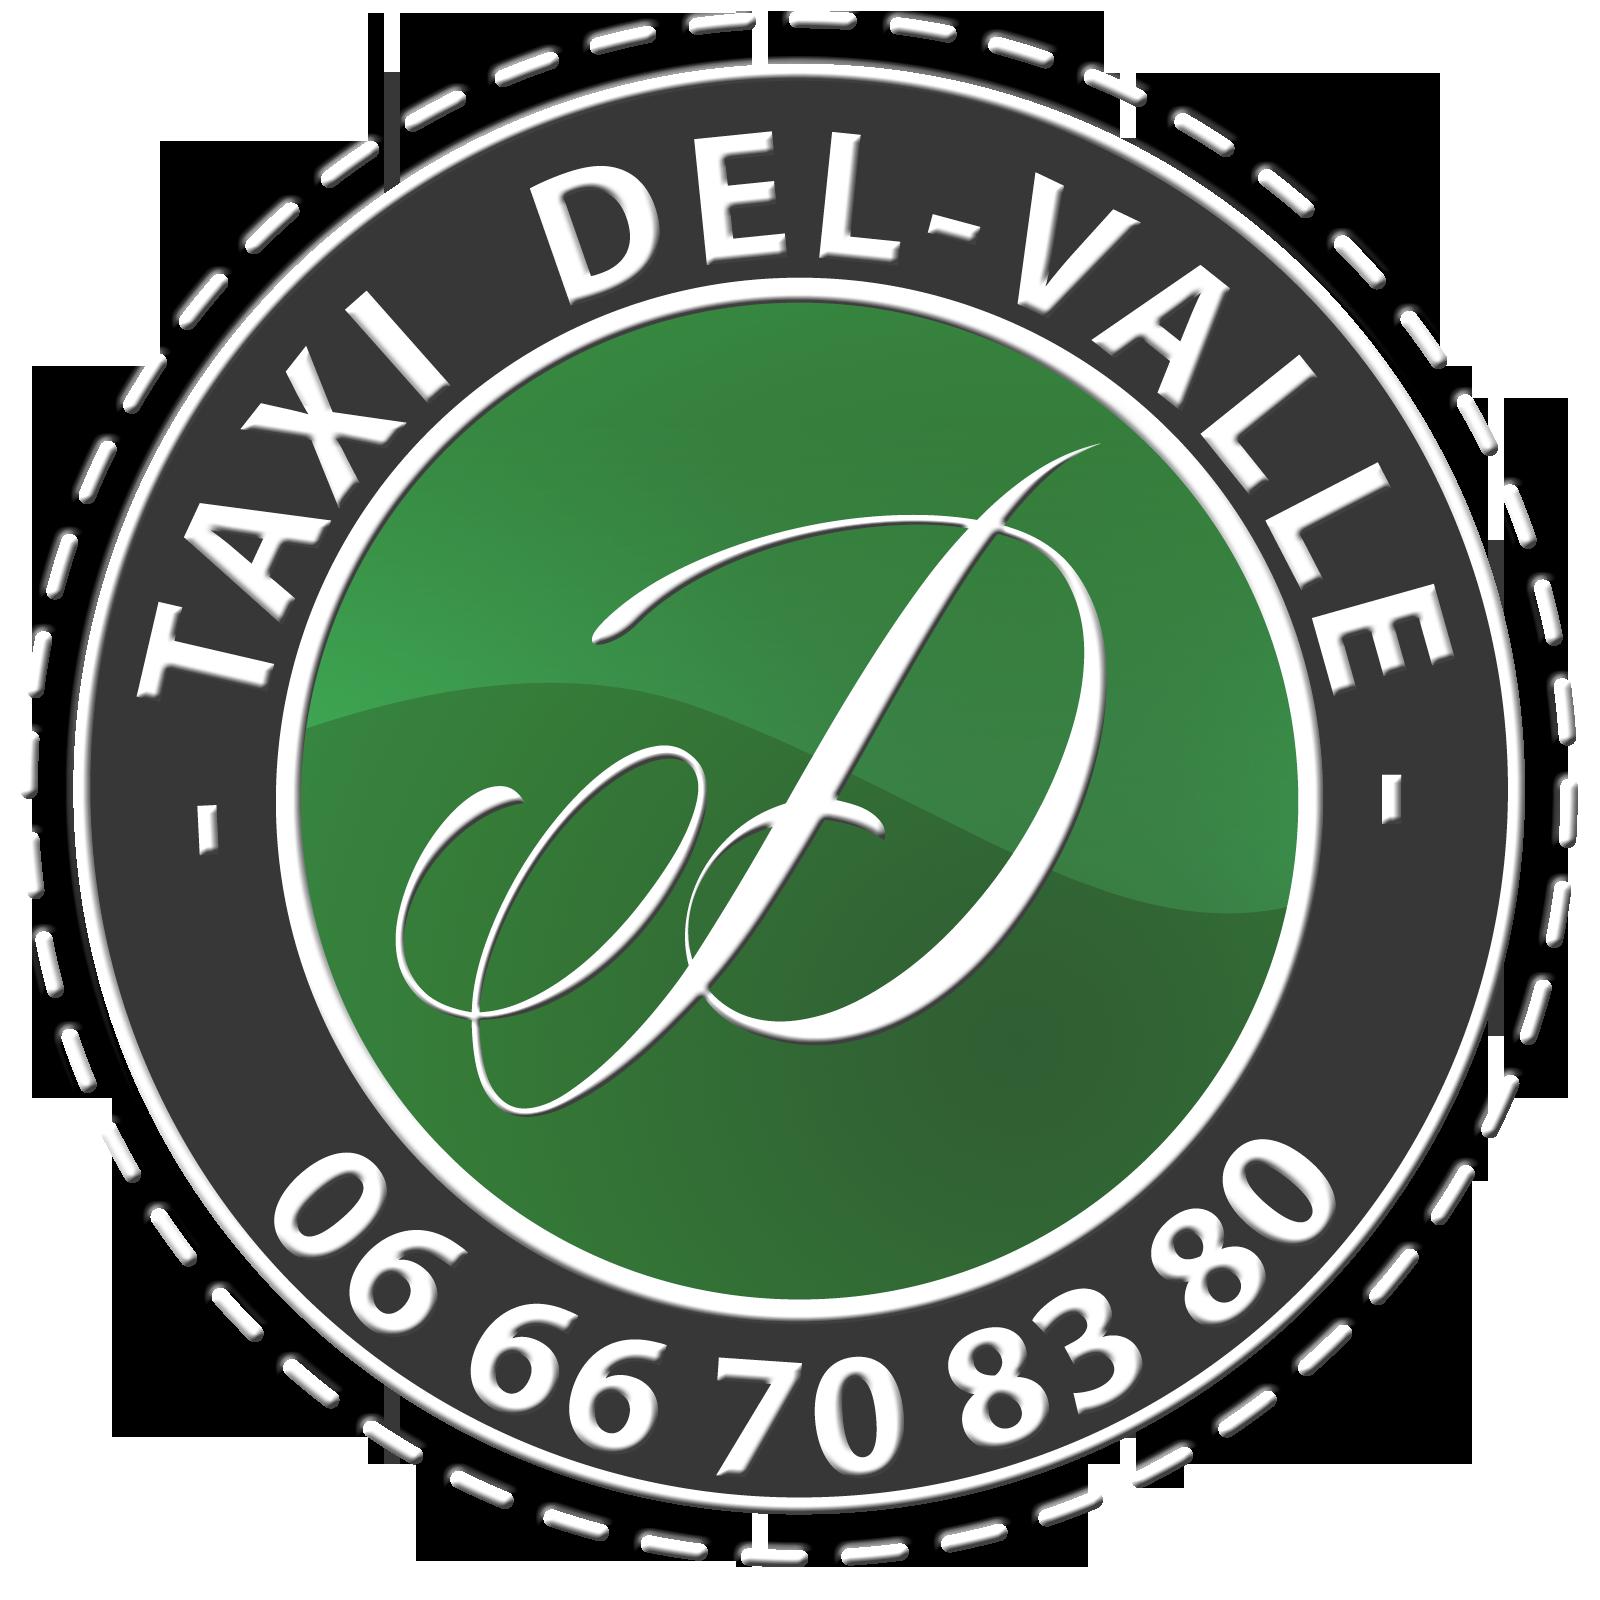 Taxi Del-Valle